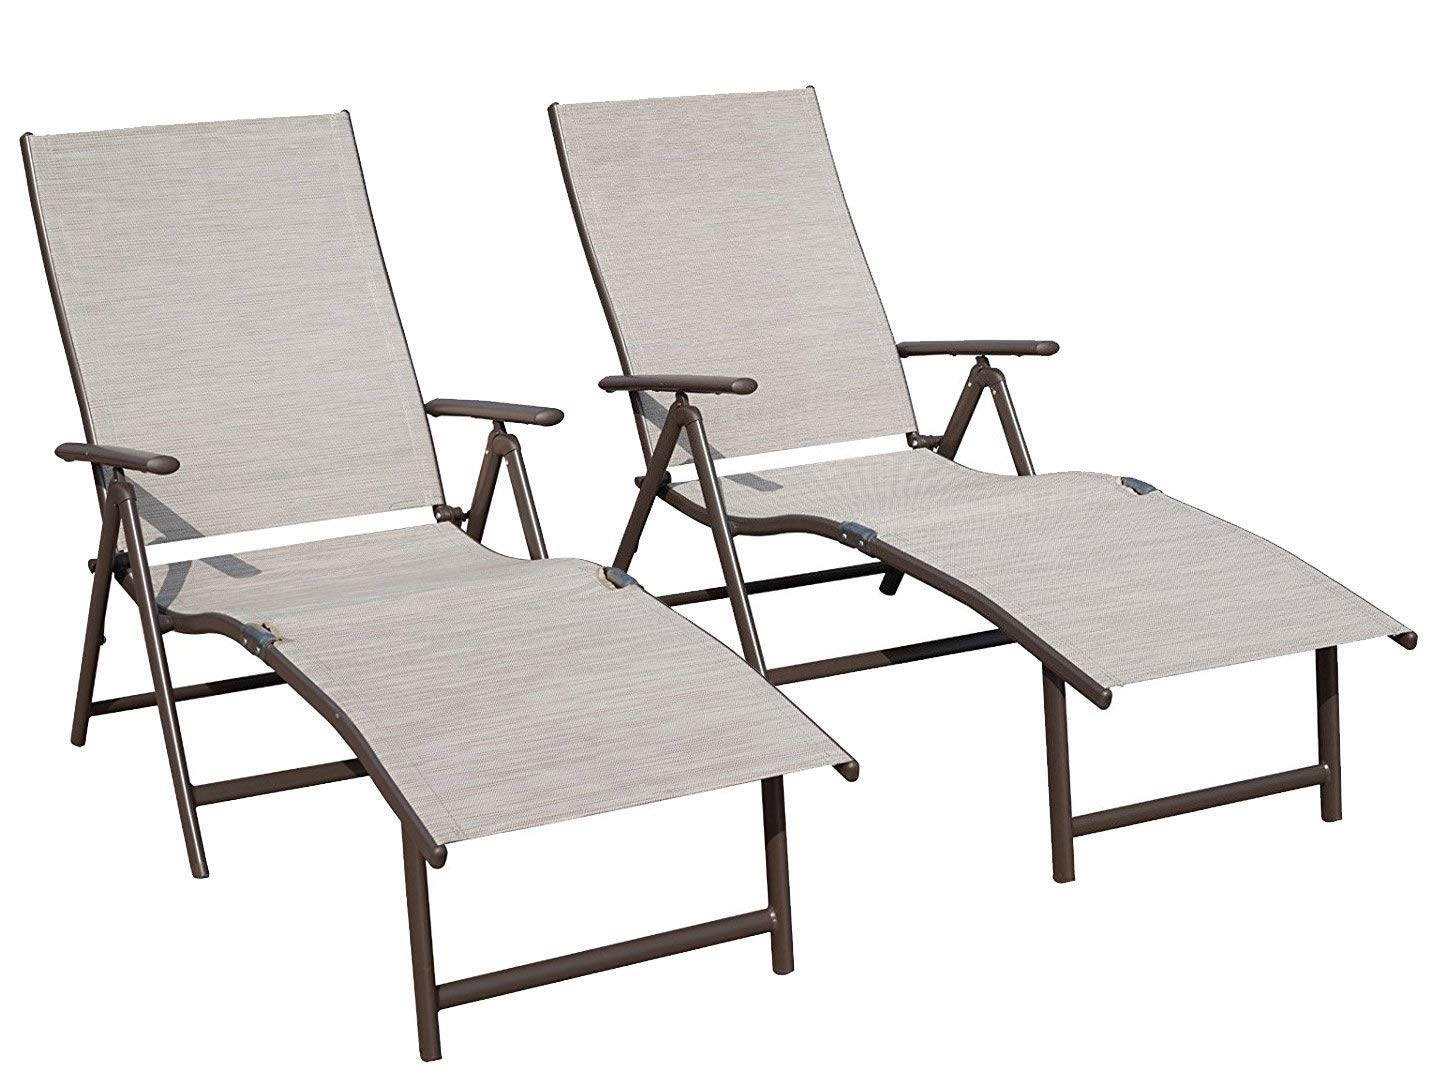 Kozyard Cozy Aluminum Beach Yard Pool Folding Reclining Adjustable Chaise Lounge Chair (Beige,2 Packs)